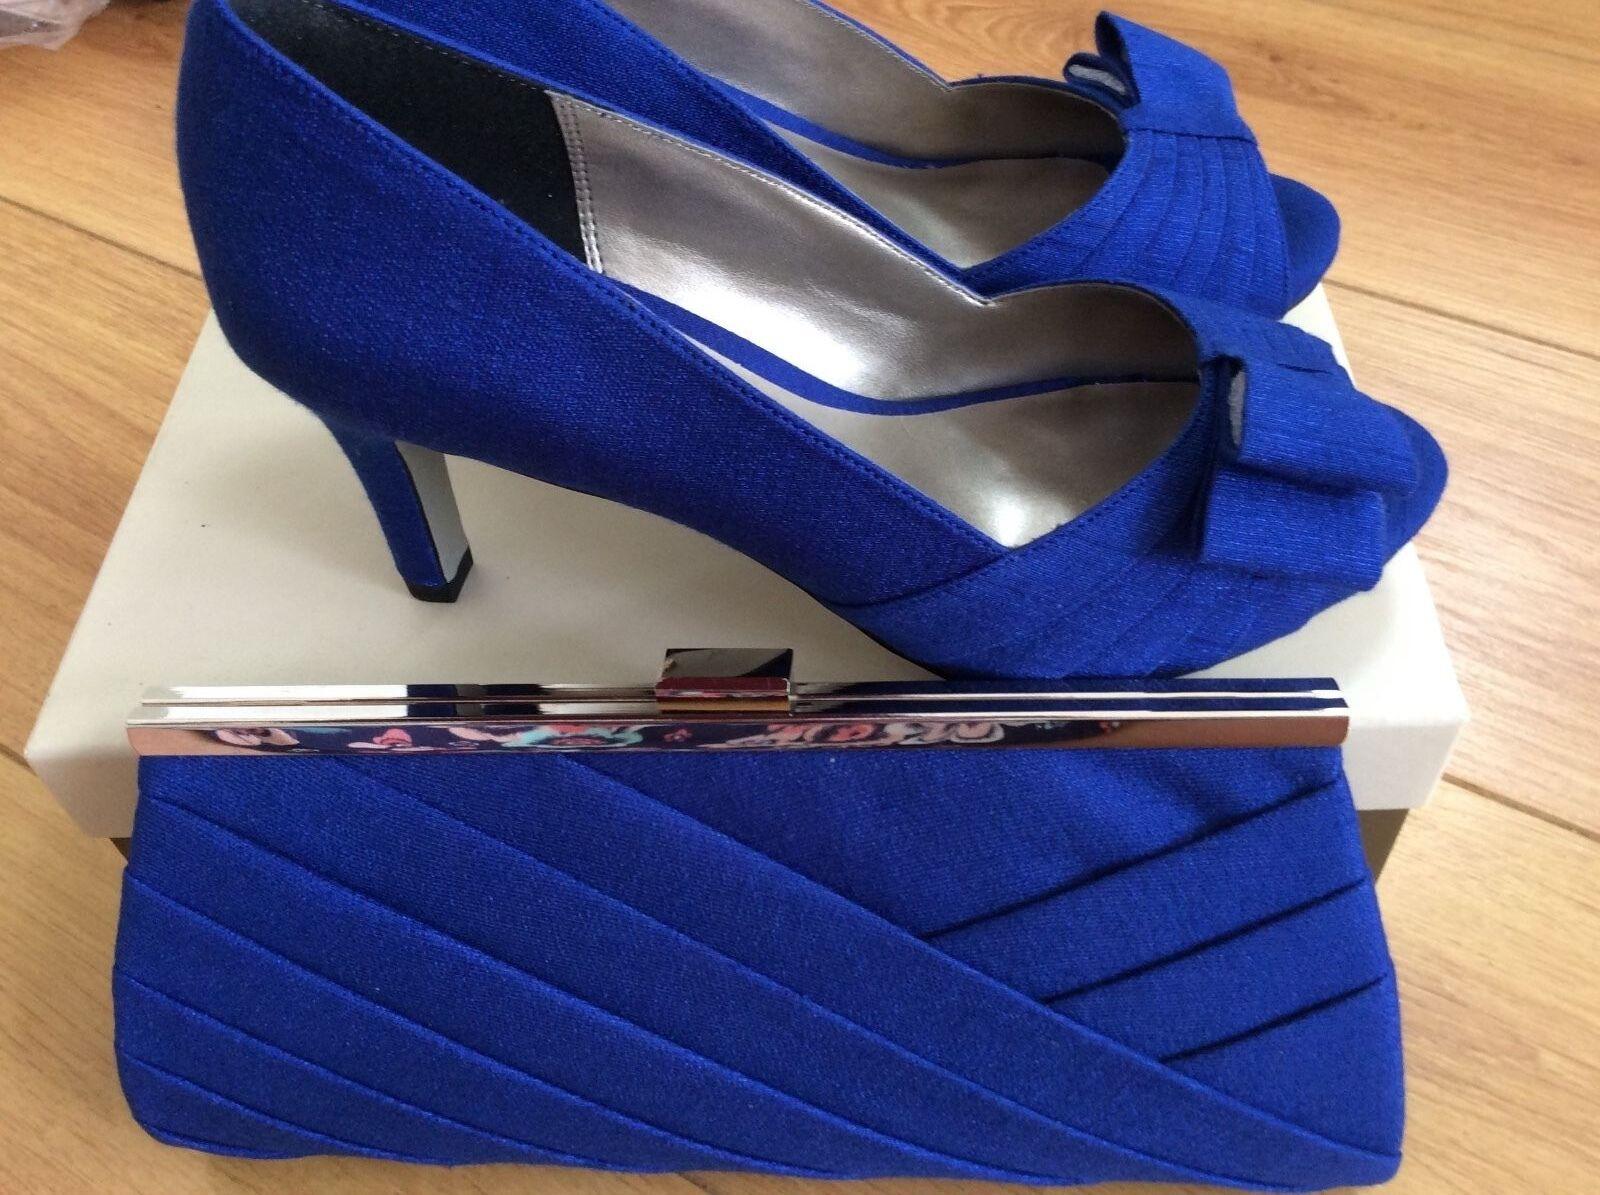 NUOVO goegeous & Elegante 5, Jacques Vert Scarpe, taglia 5, Elegante Blu & corrispondenza Borsetta bb8a58